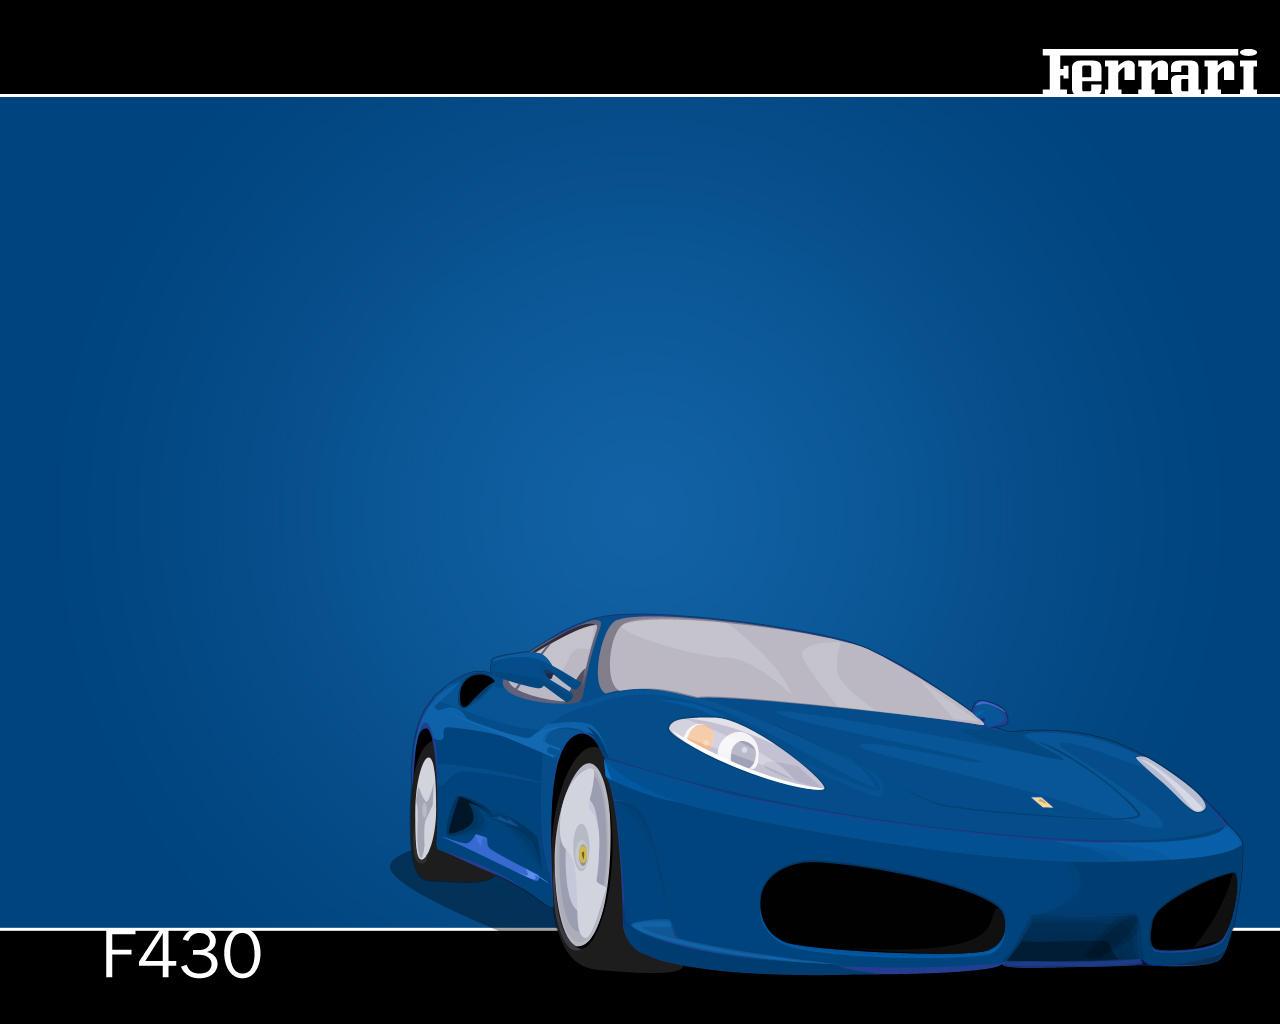 Ferrari F430 Vector Blue by V3ct0r